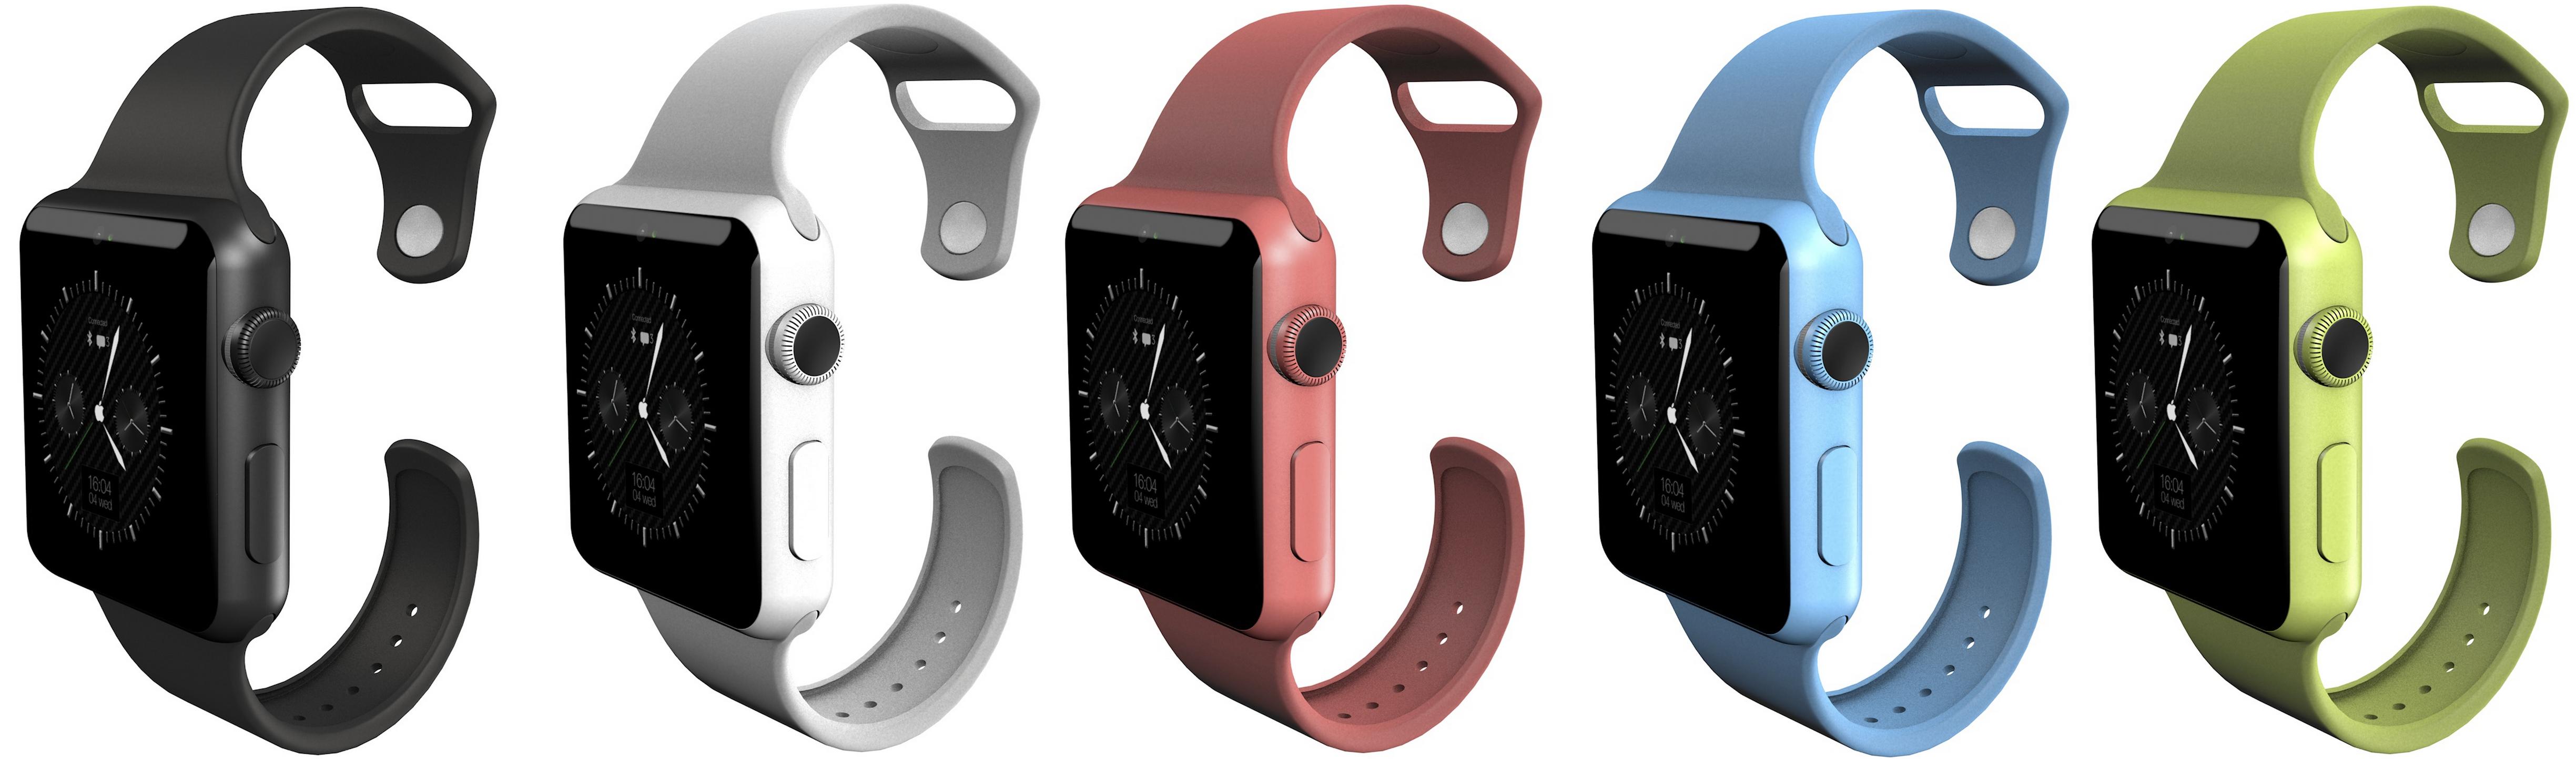 Apple Watch 2 concept 10